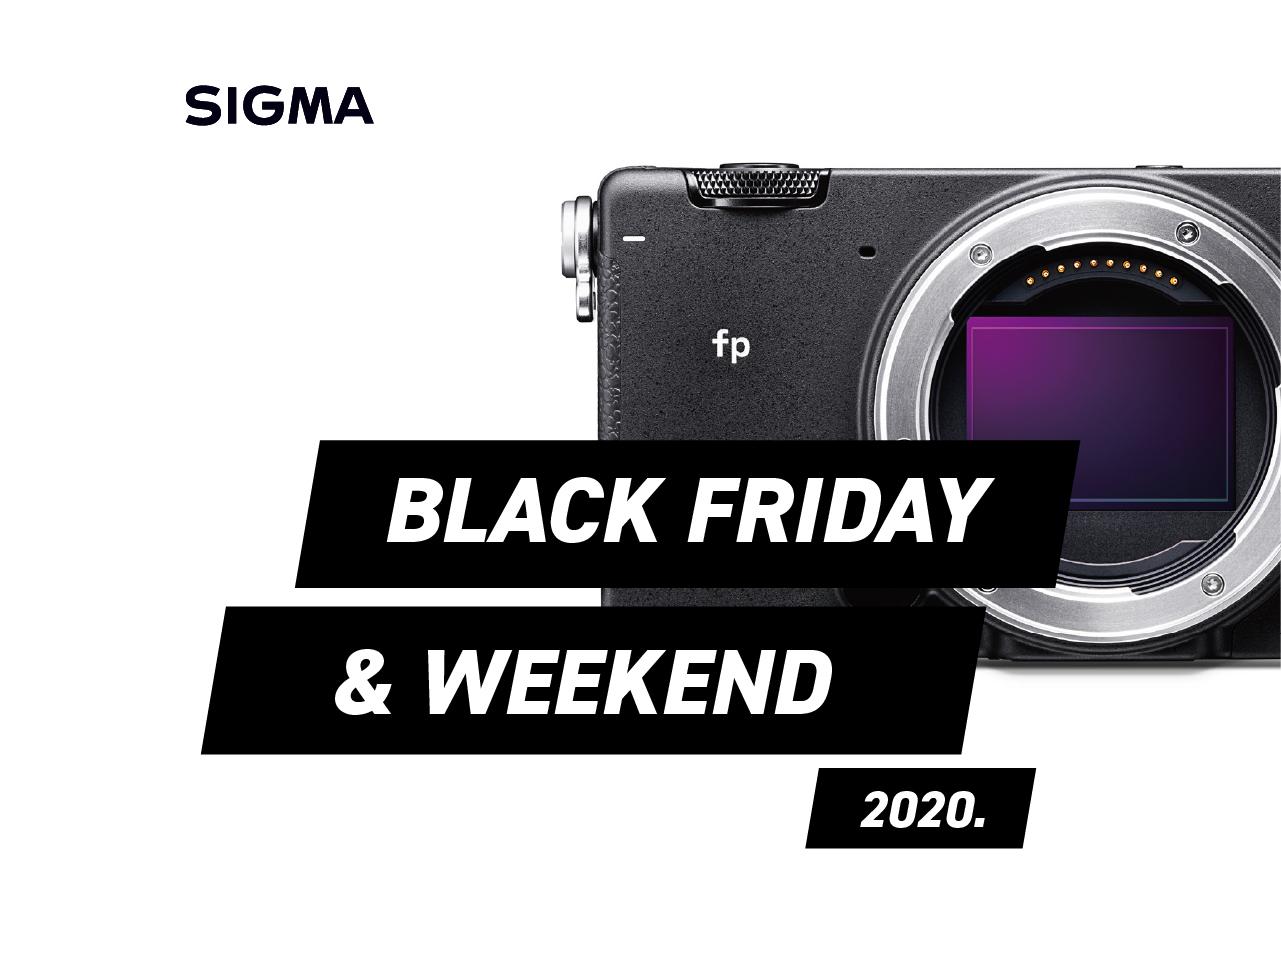 SIGMA Black Friday 2020